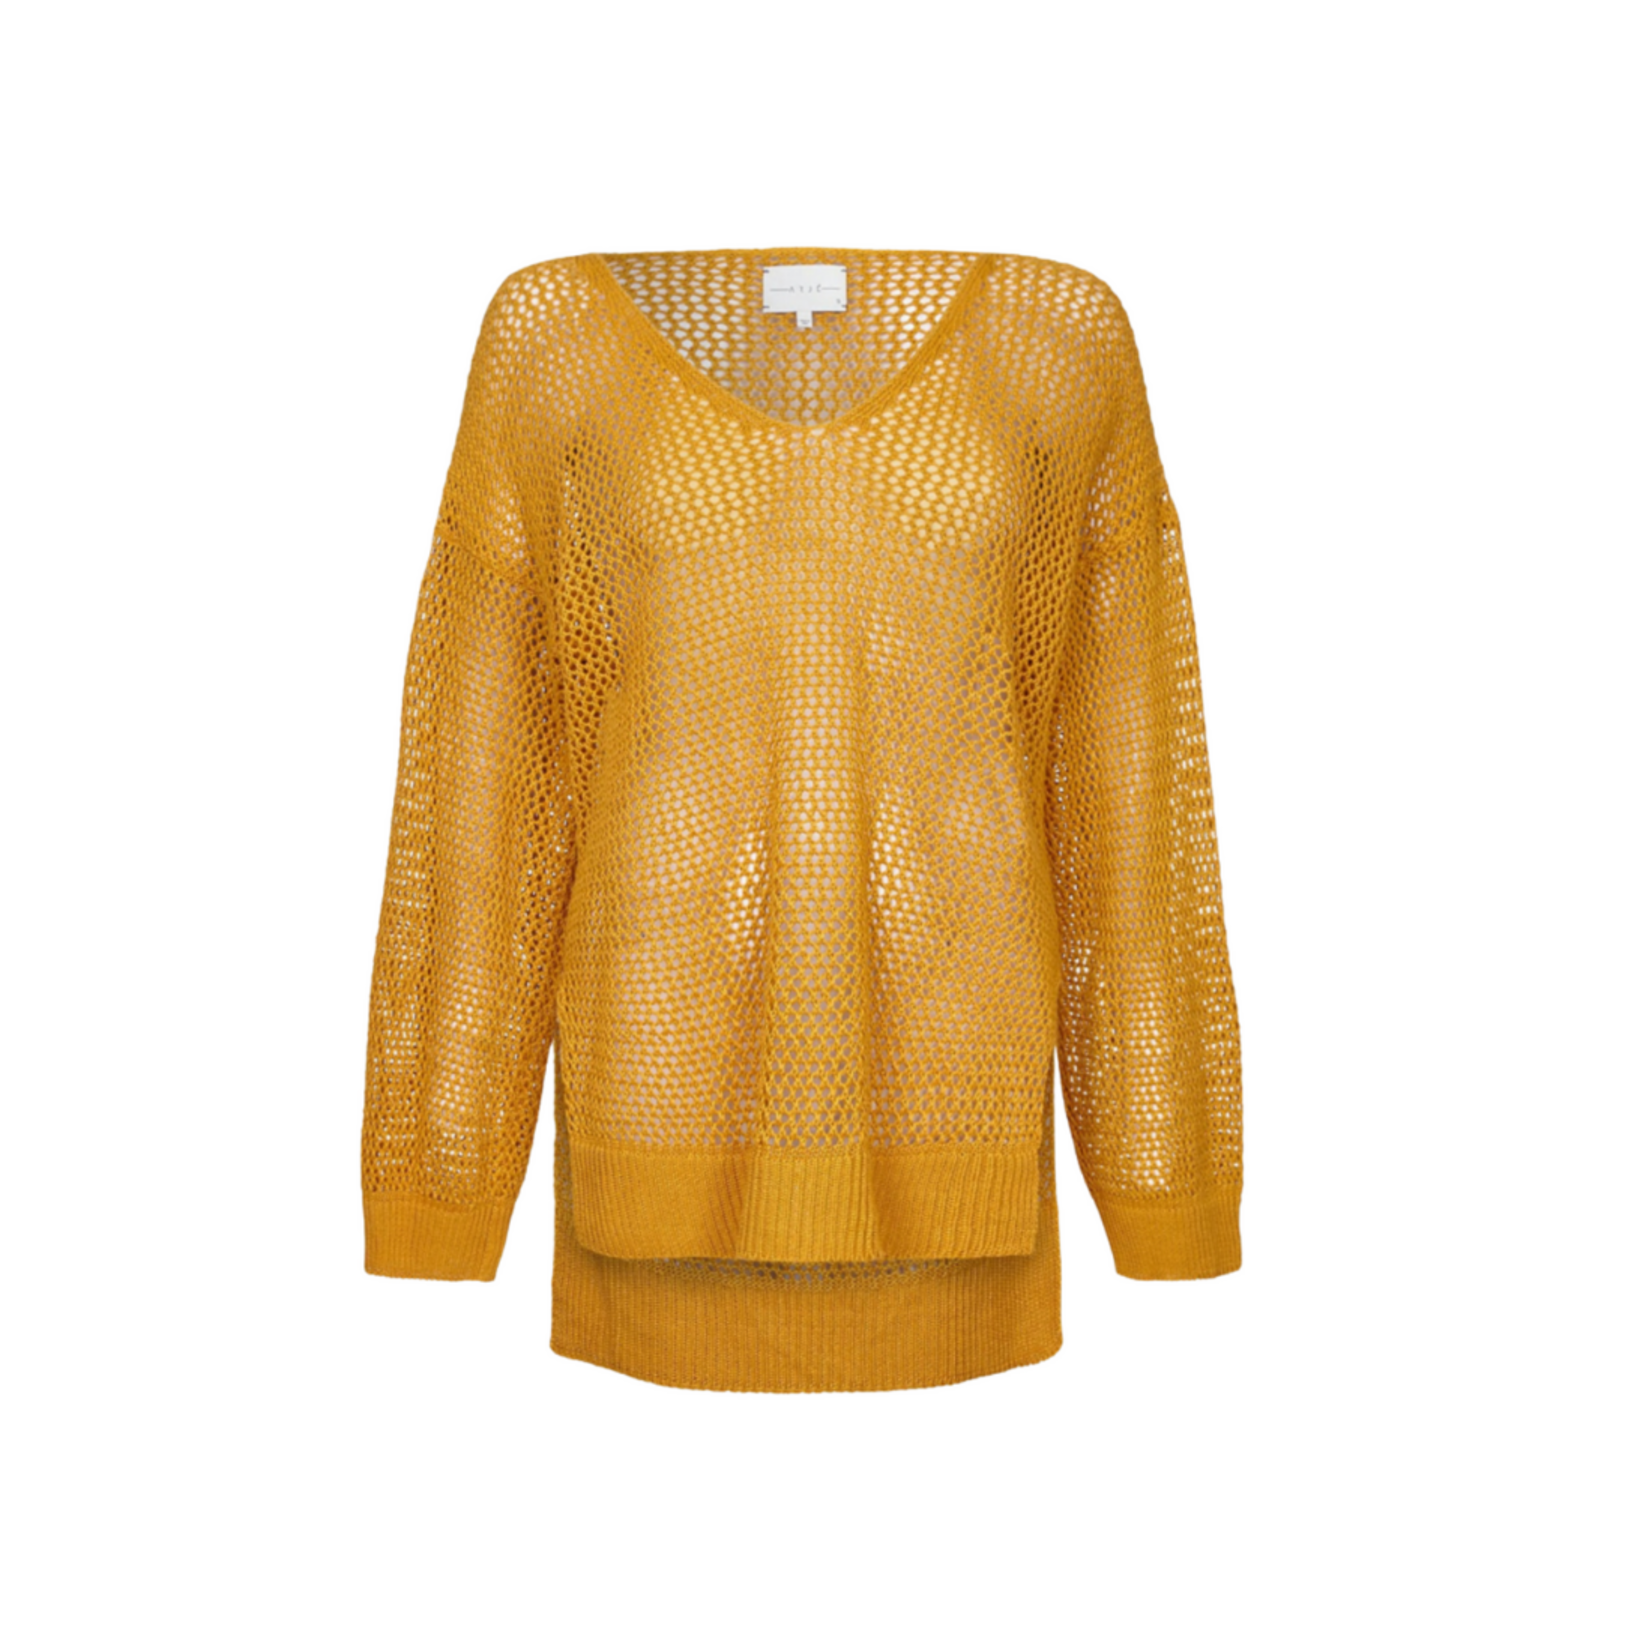 Arjé Lila Linen Basket Knit Box Sweater Saffron